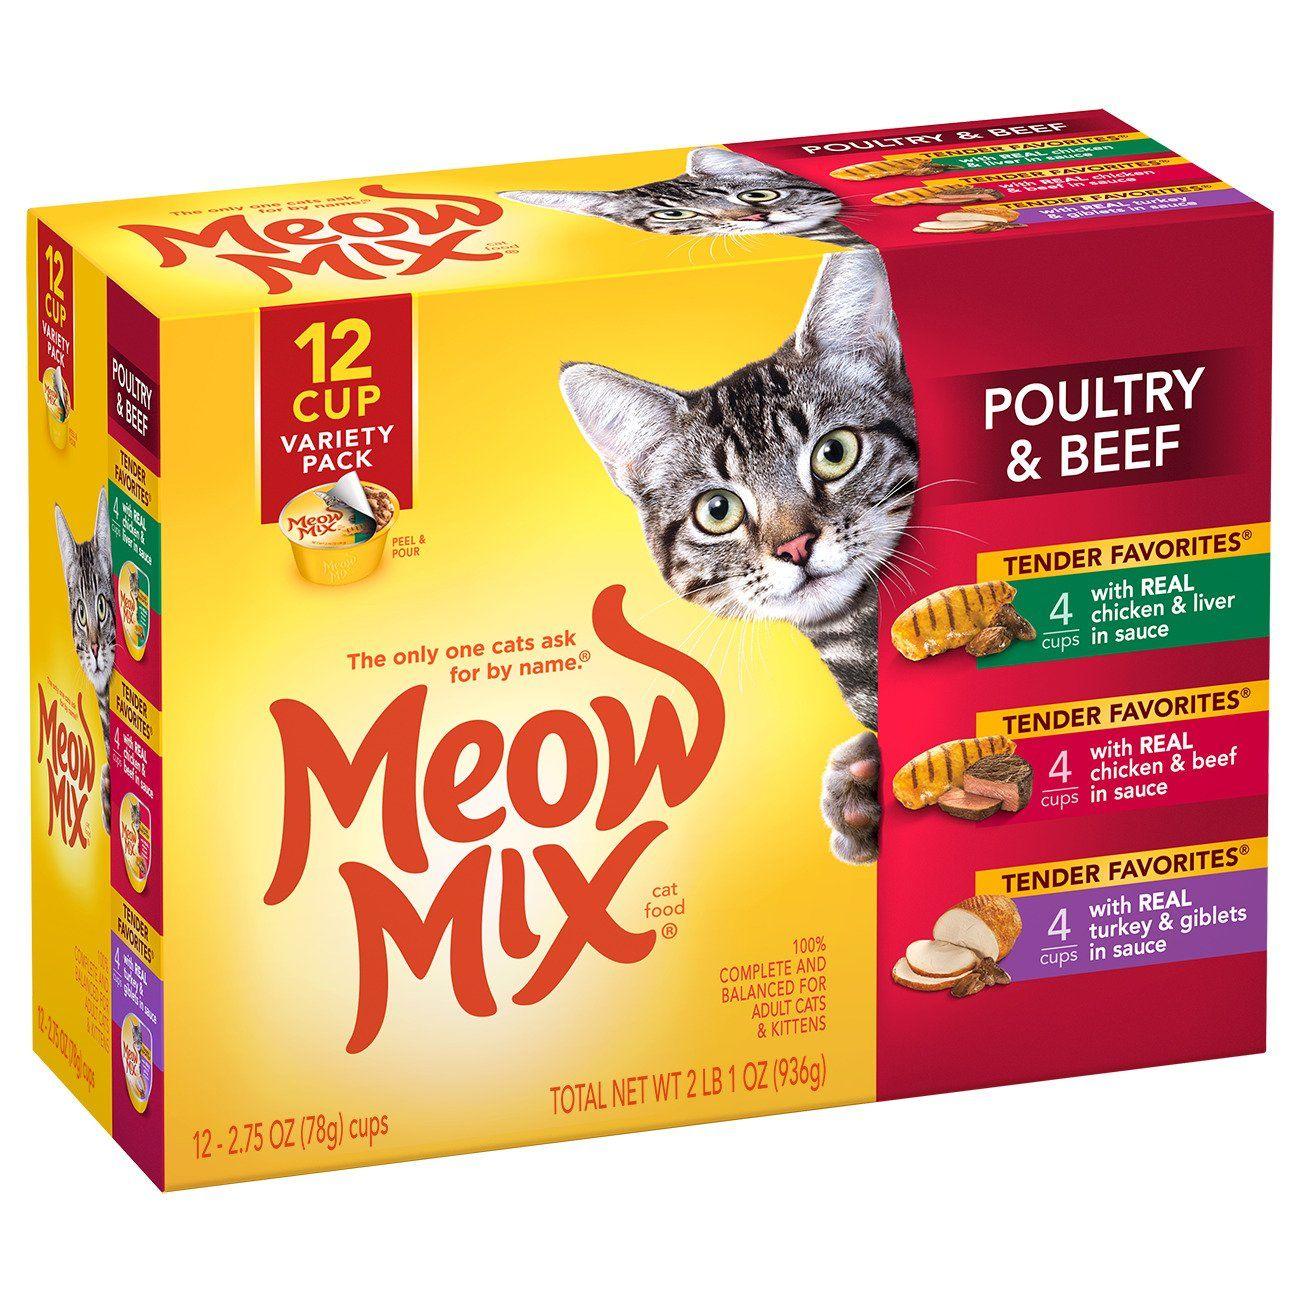 Soft Fluffy Cats in 2020 Wet cat food, Cat pet supplies